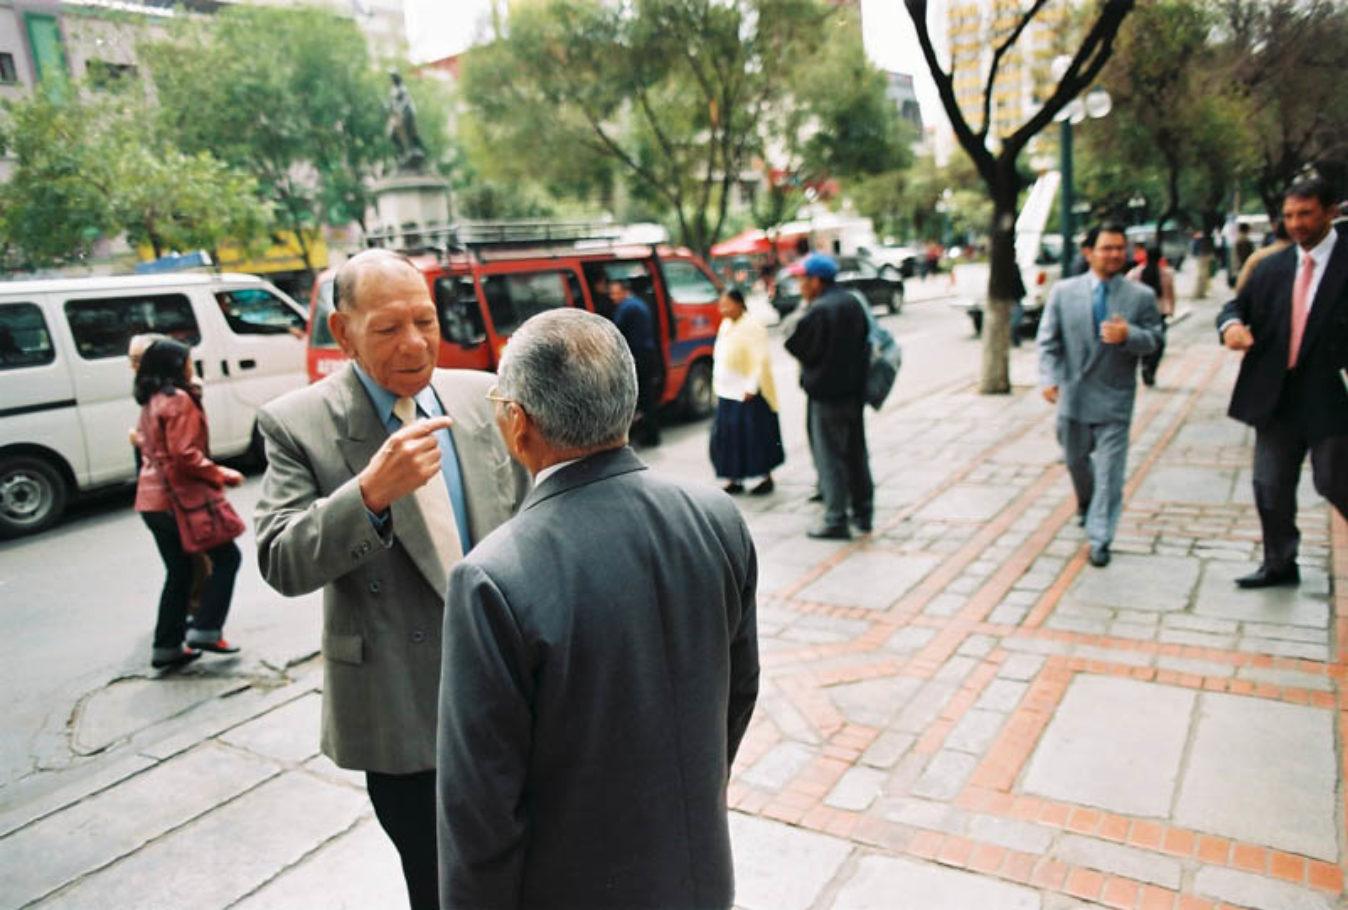 la paz bolivia jorge ferrufino